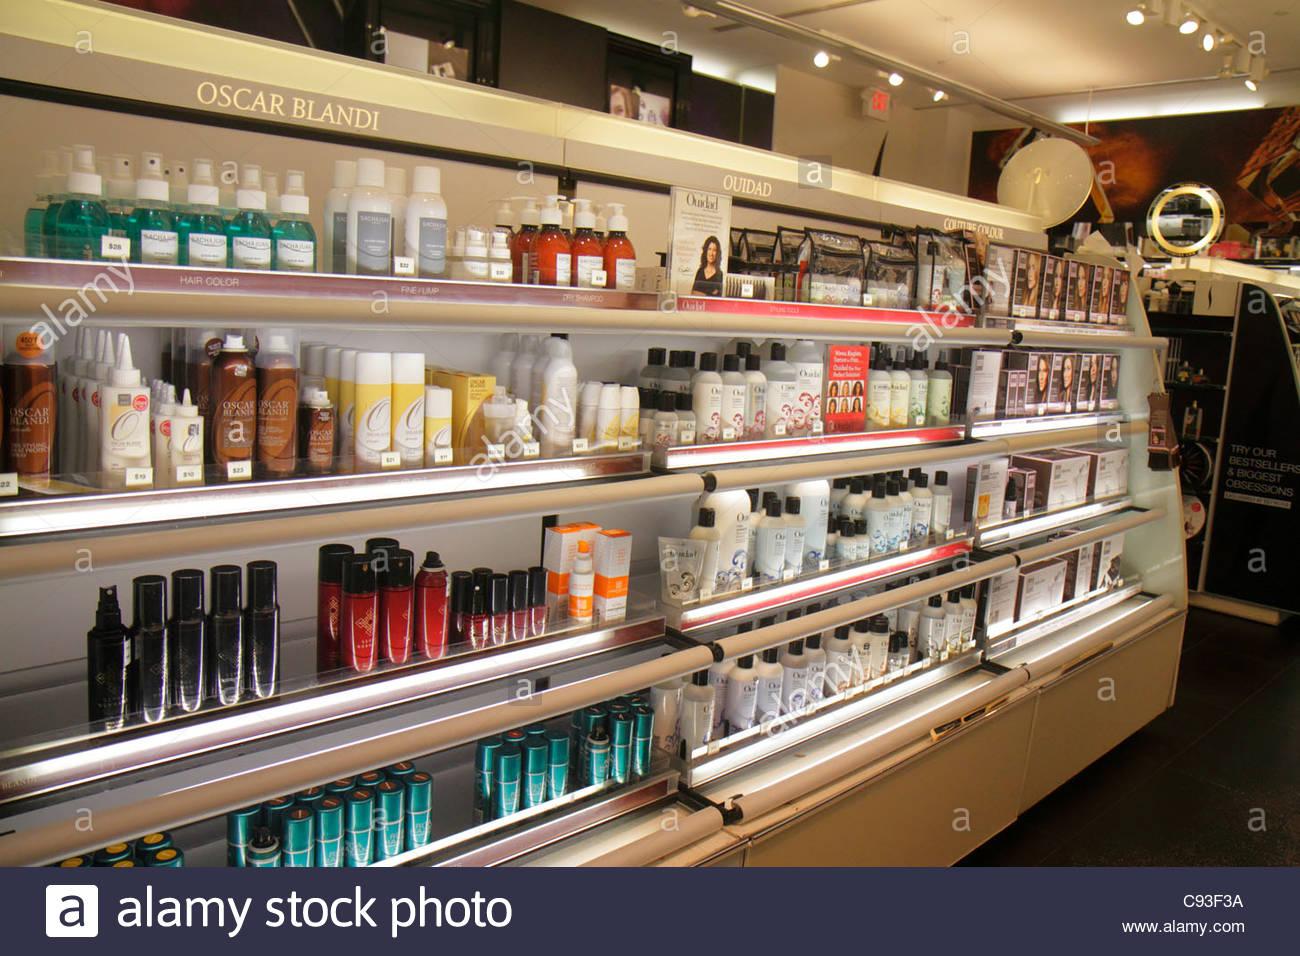 Sephora Make Up Stock Photos & Sephora Make Up Stock Images - Alamy